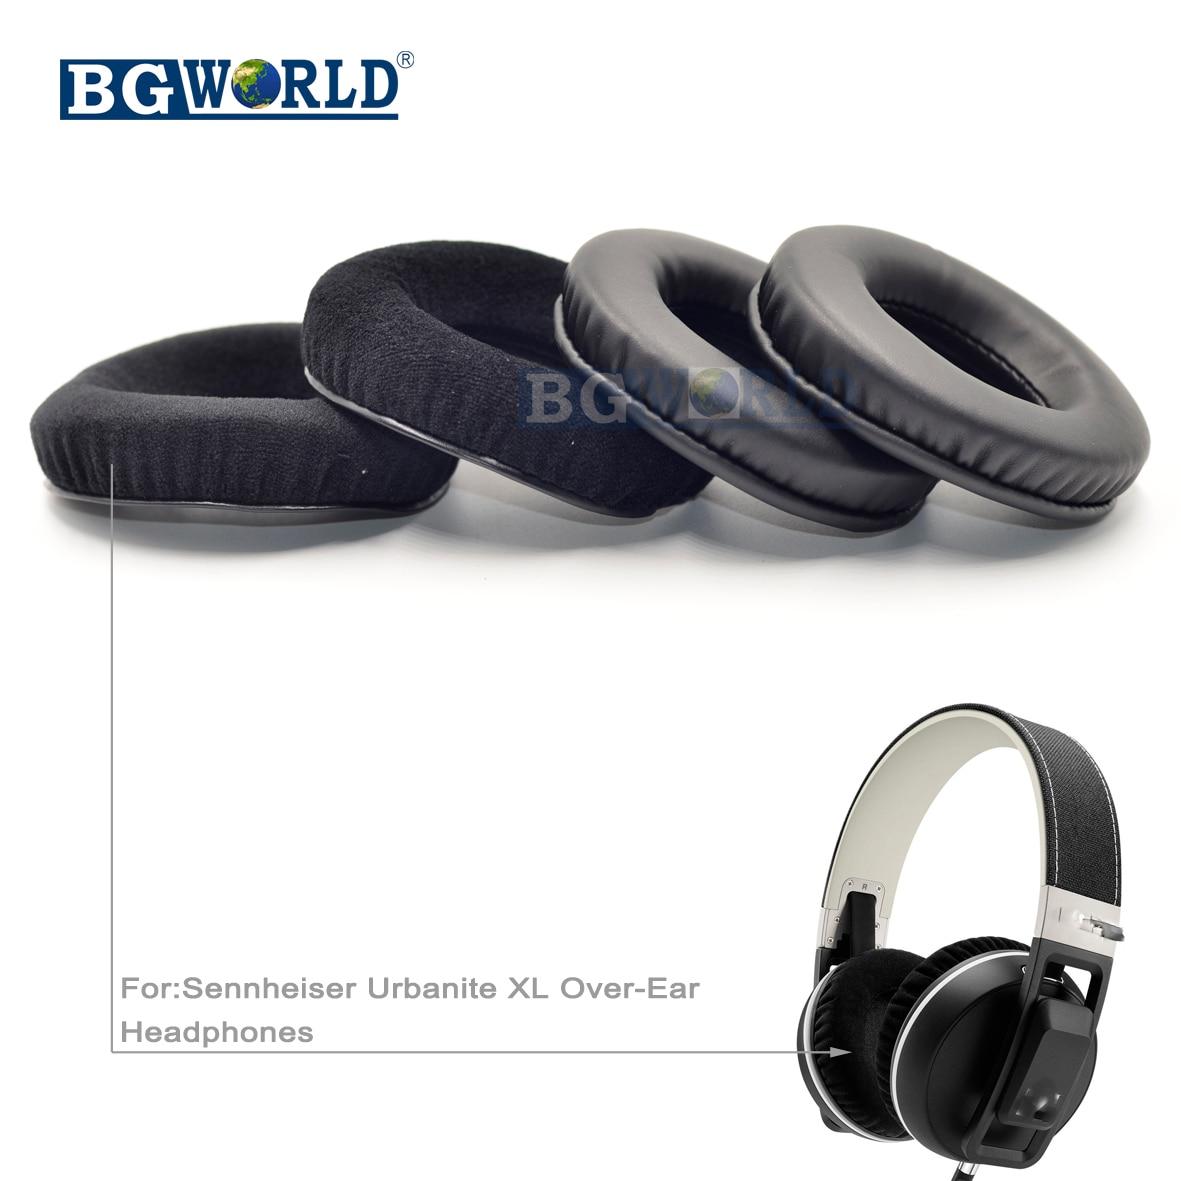 08792ef75fb BGWORLD Replacement cushion ear pads pillow EARPADS for Sennheiser URBANITE  XL WIRELESS Over ear headset headphones sponge-in Earphone Accessories from  ...